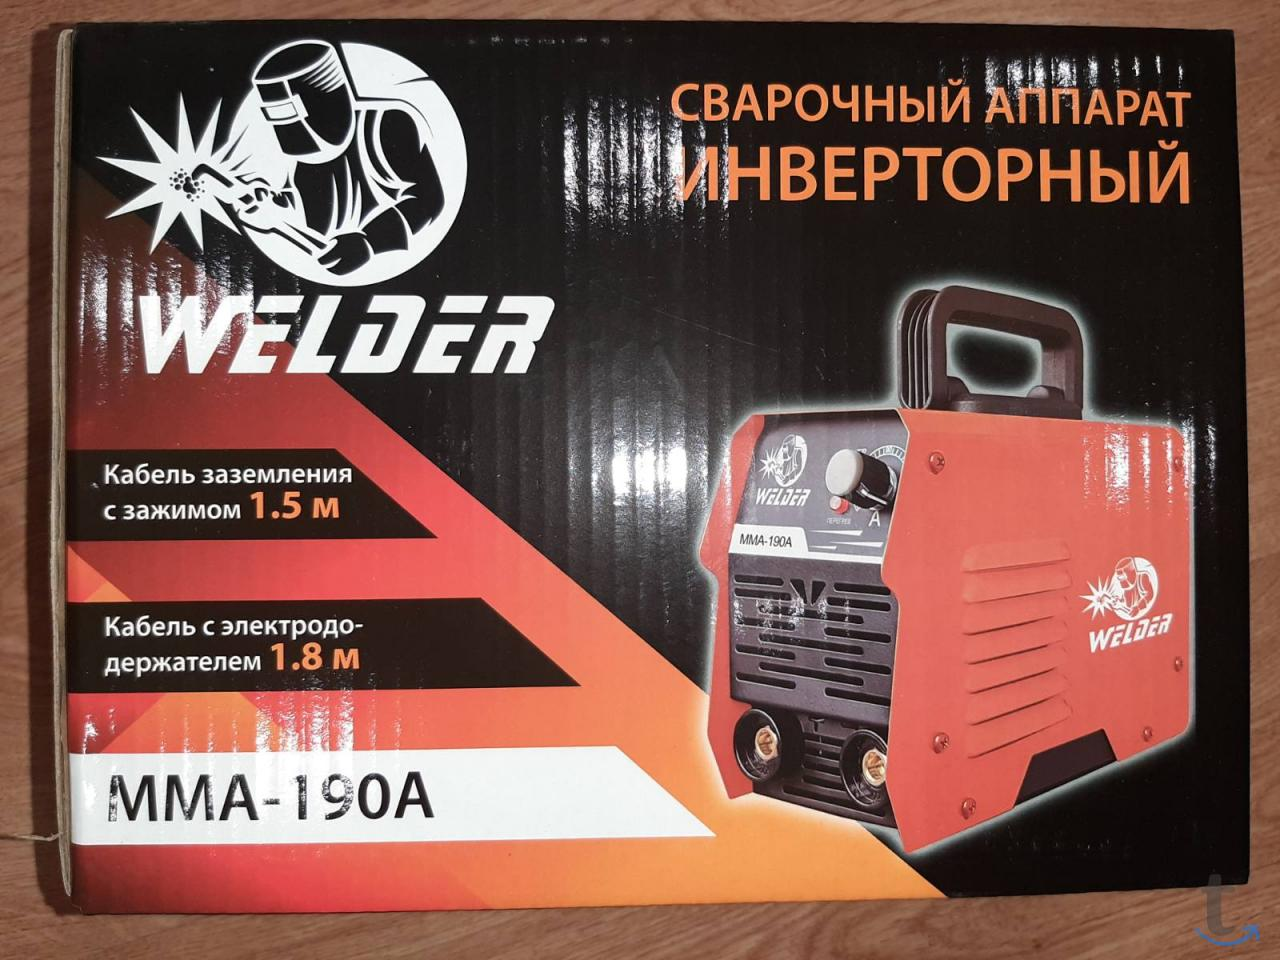 Сварочный аппарат ММА 190А